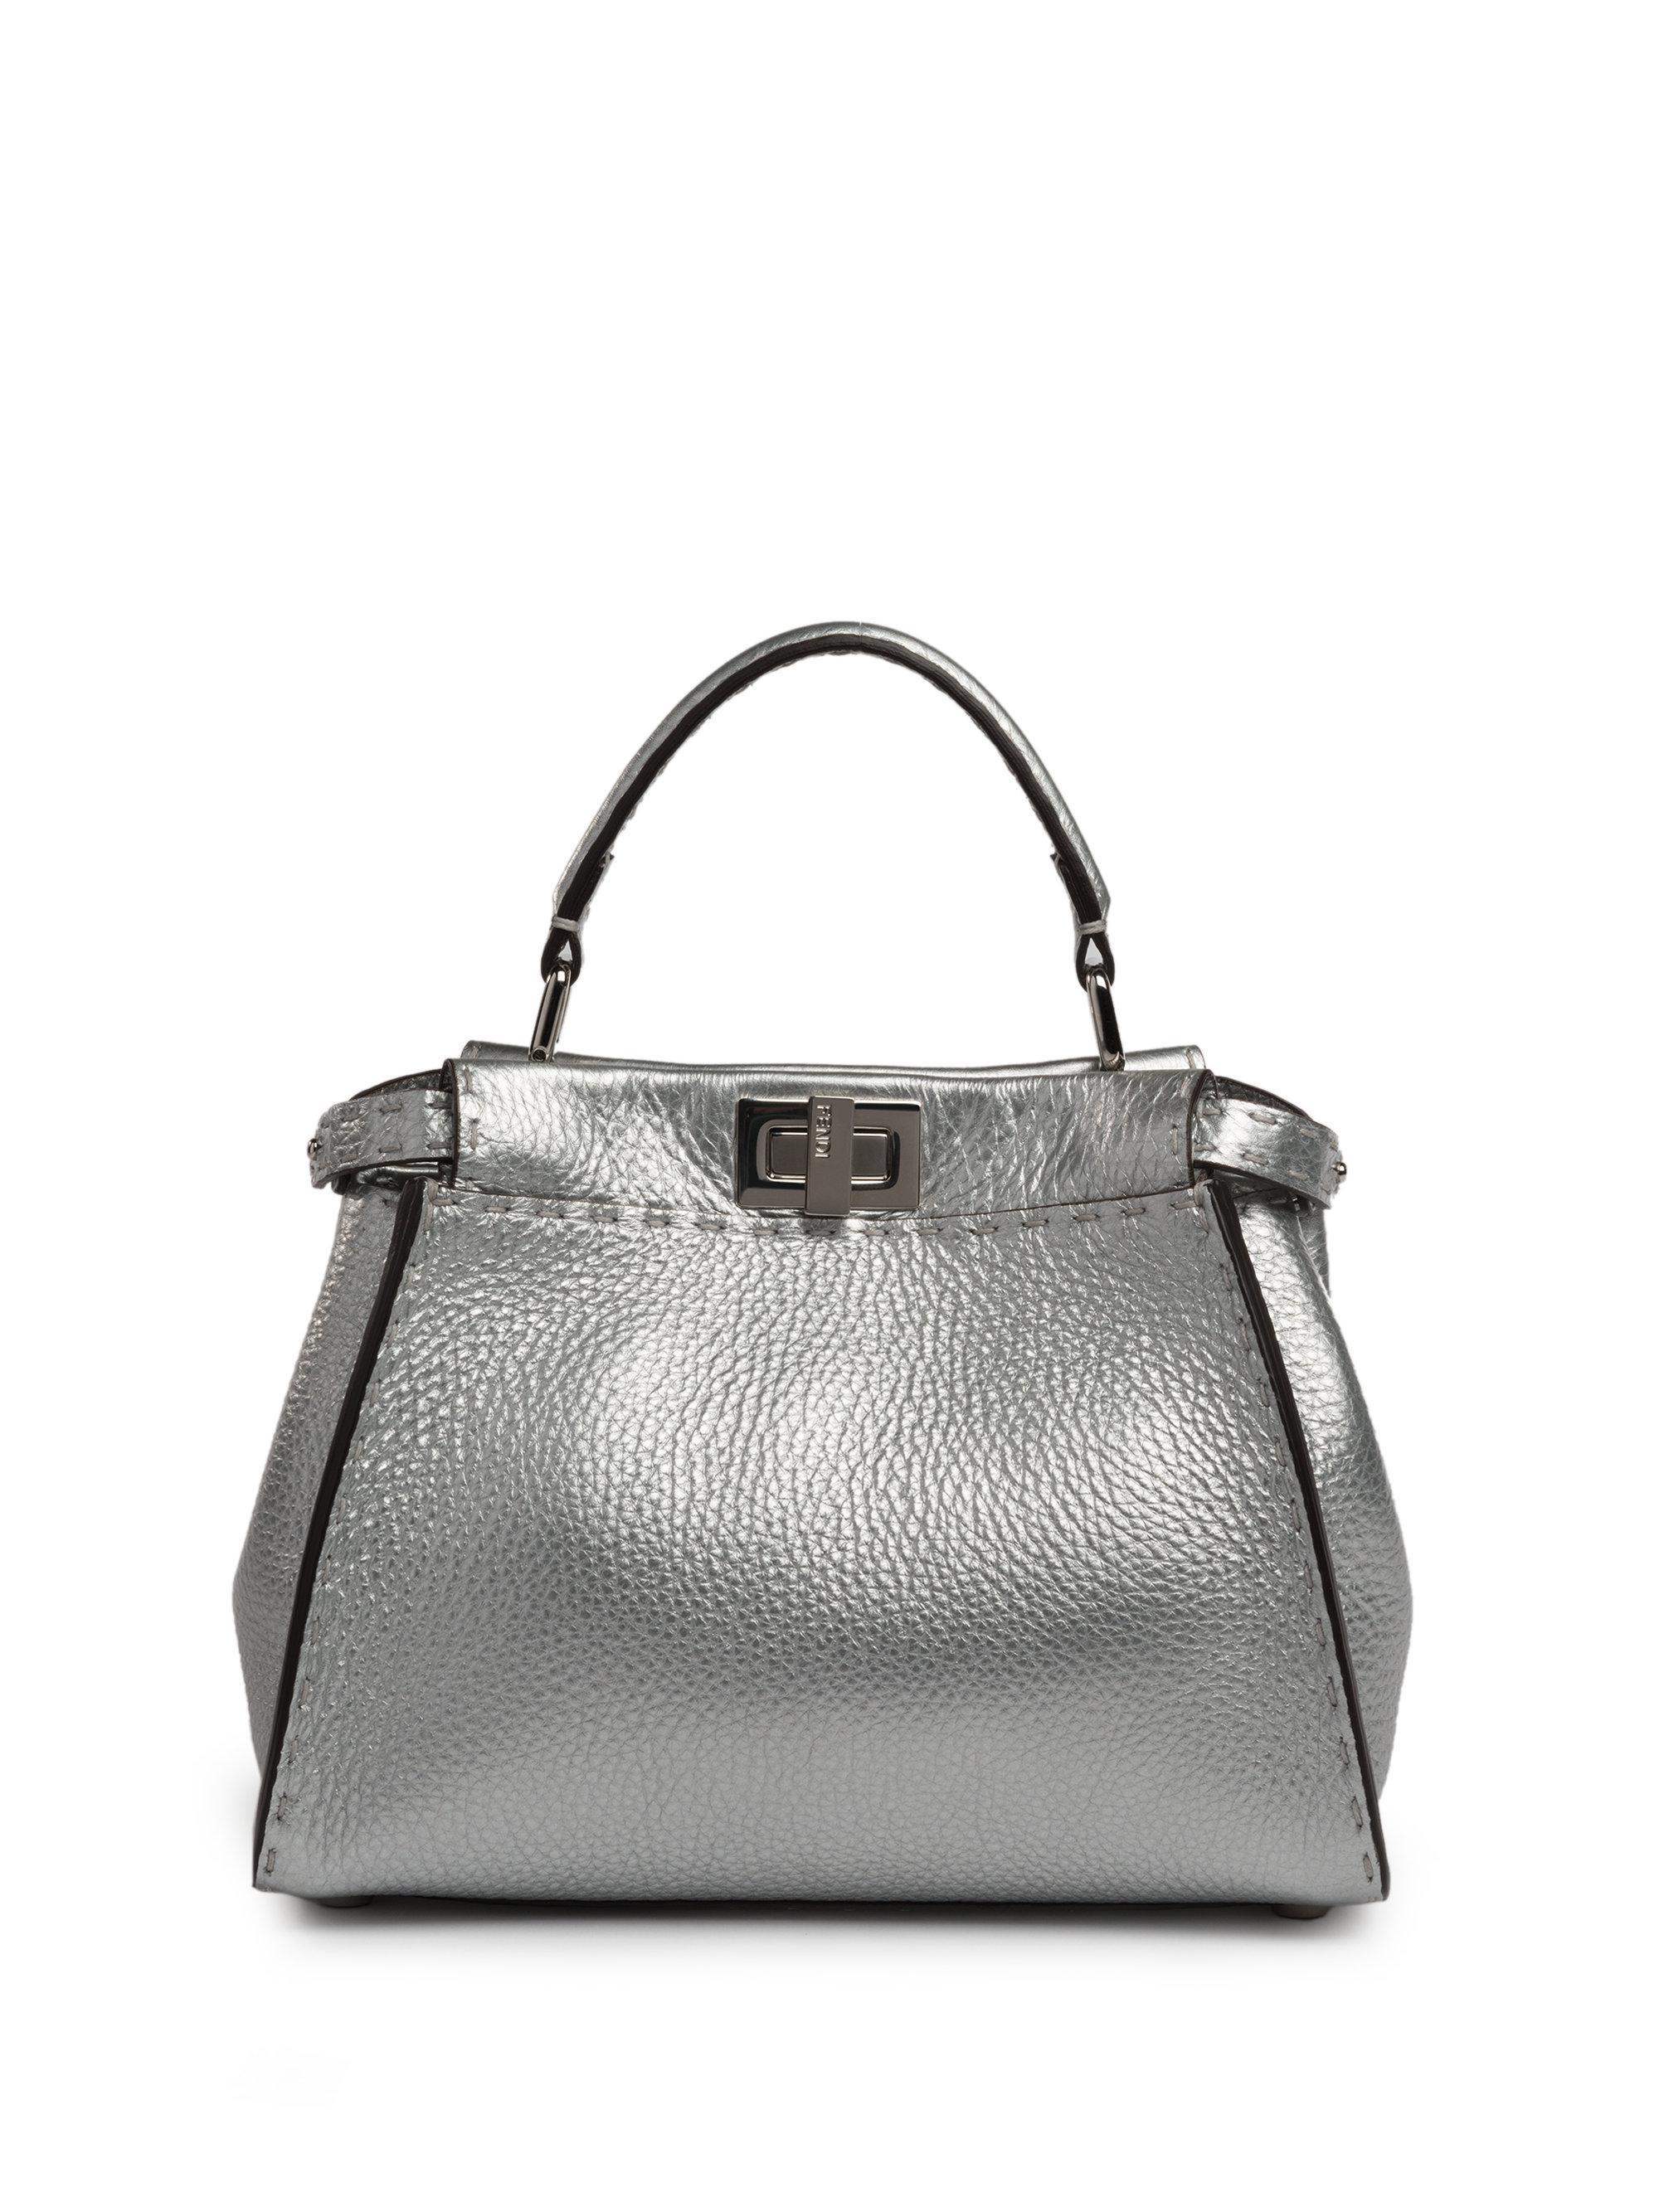 aa9cf47c1f ... germany lyst fendi selleria peekaboo mini metallic leather satchel in  metallic d9a1a 80351 ...